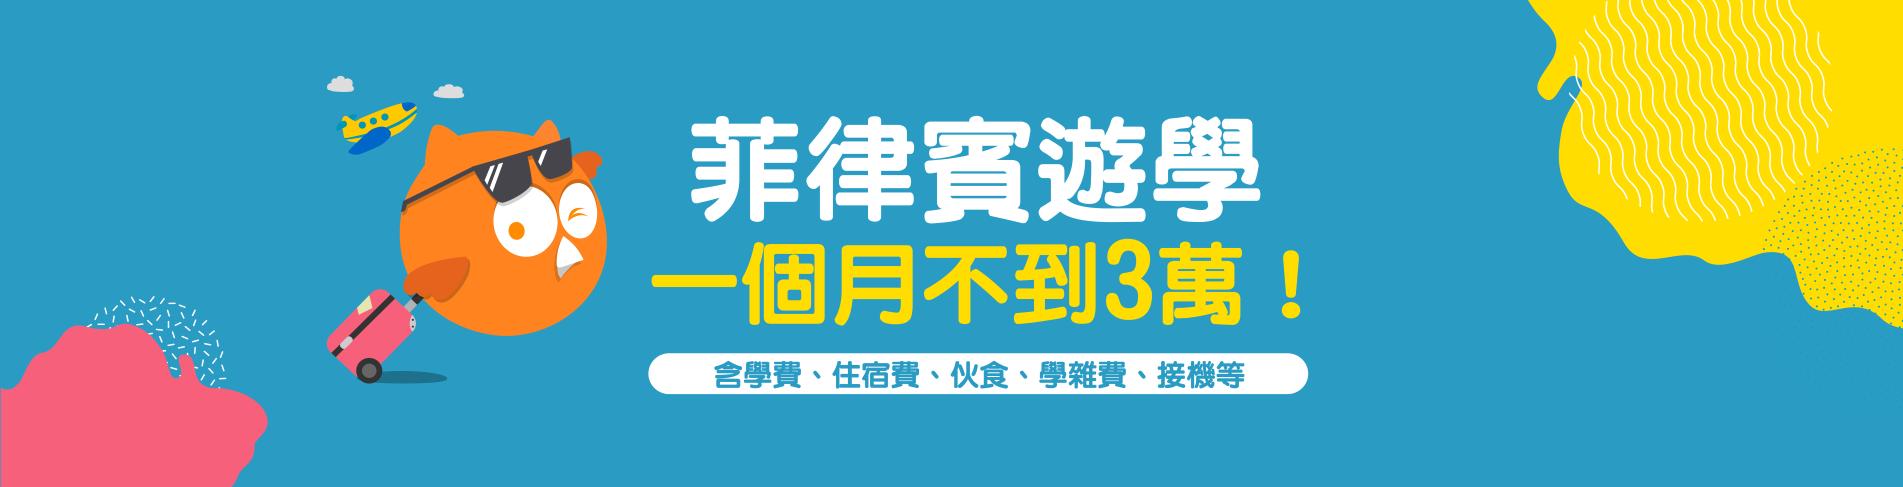 taiwan engoo banner